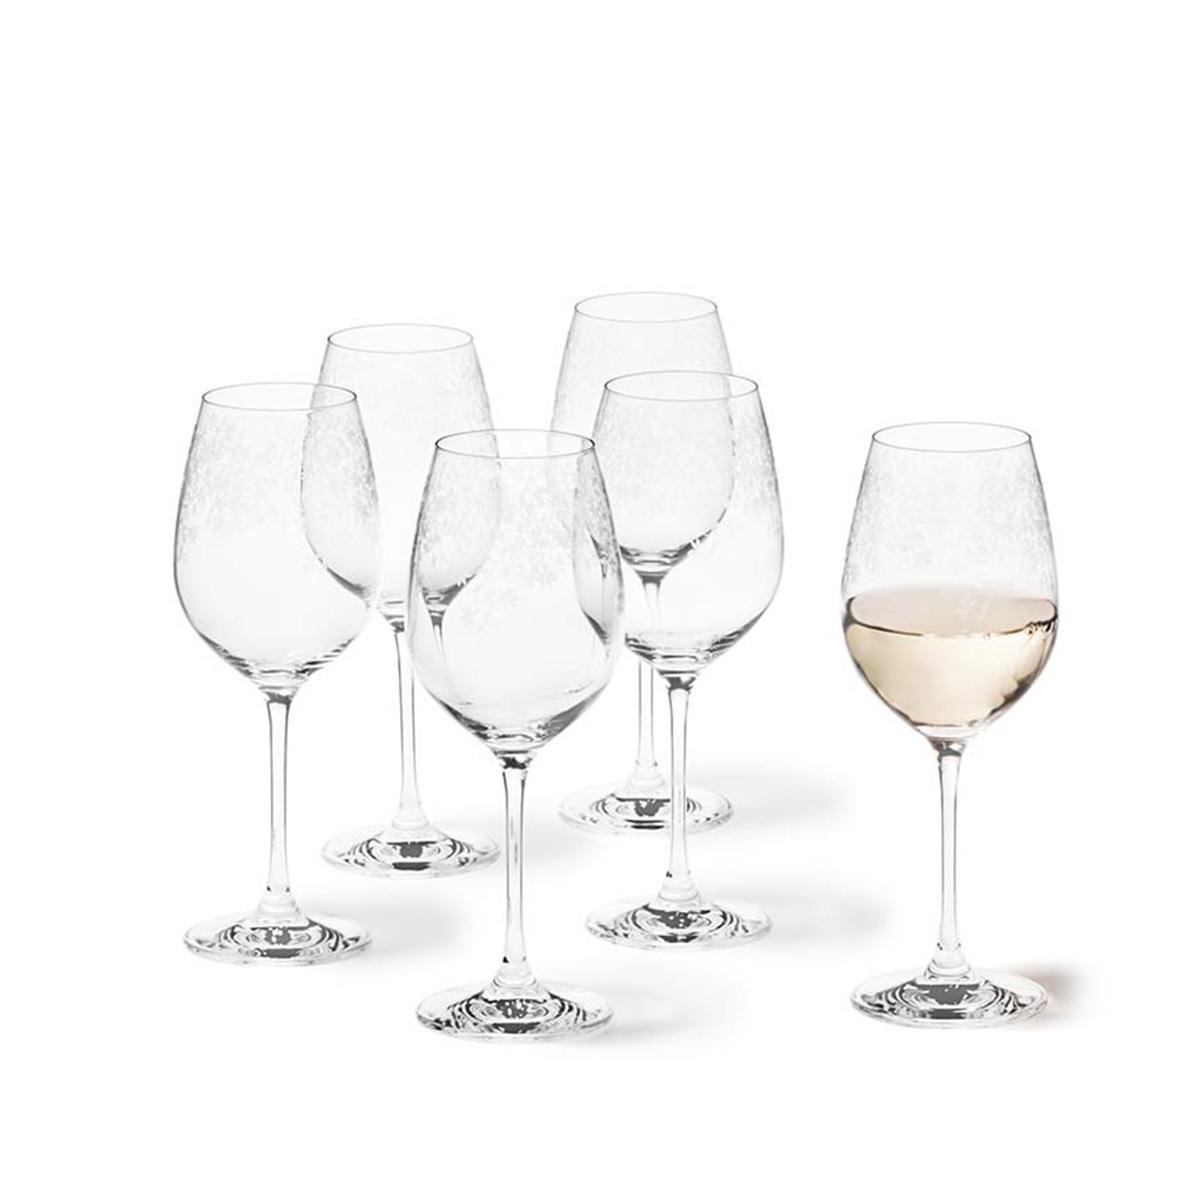 Čaša za belo vino Chateau 61591